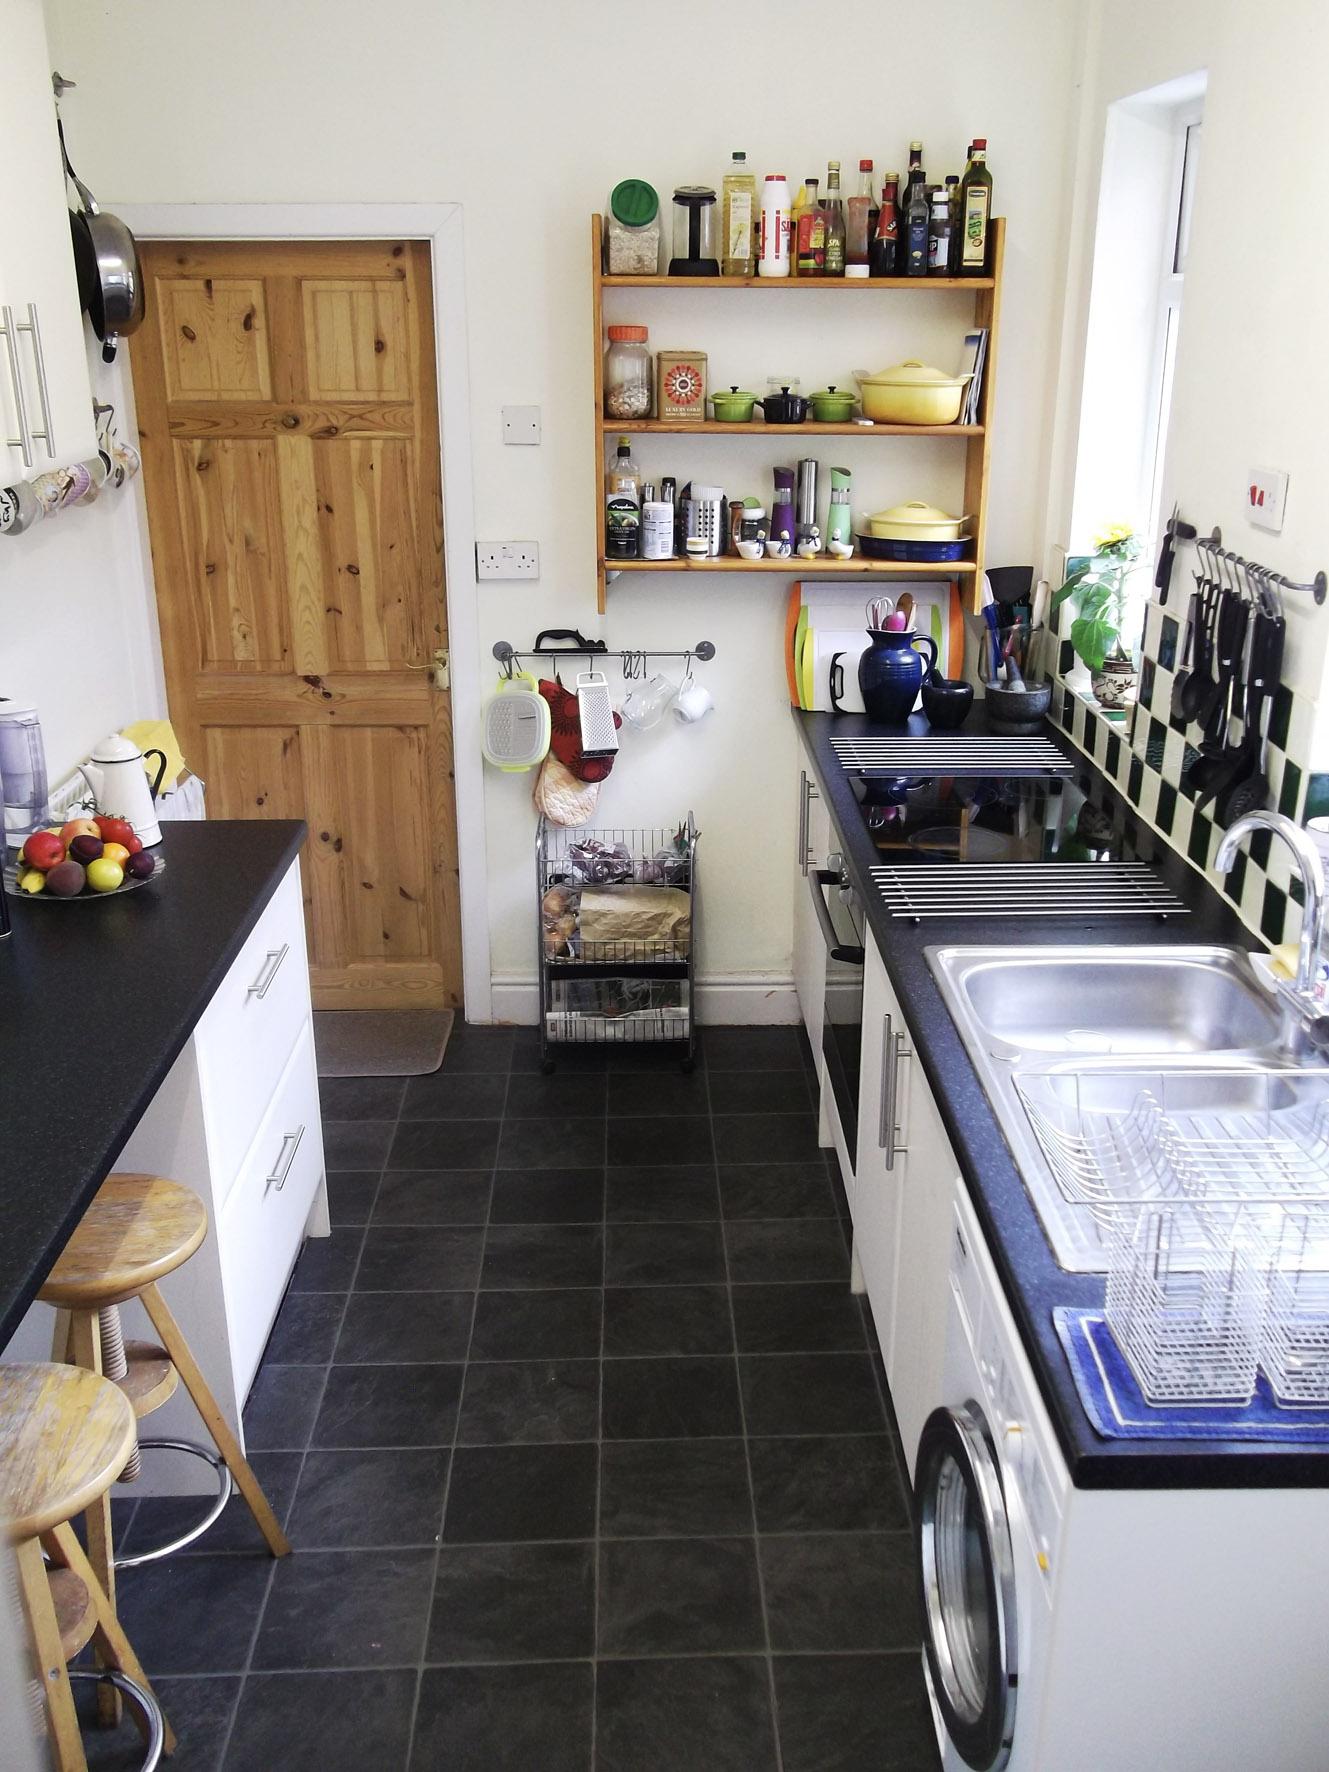 Moor St Kitchen.jpg